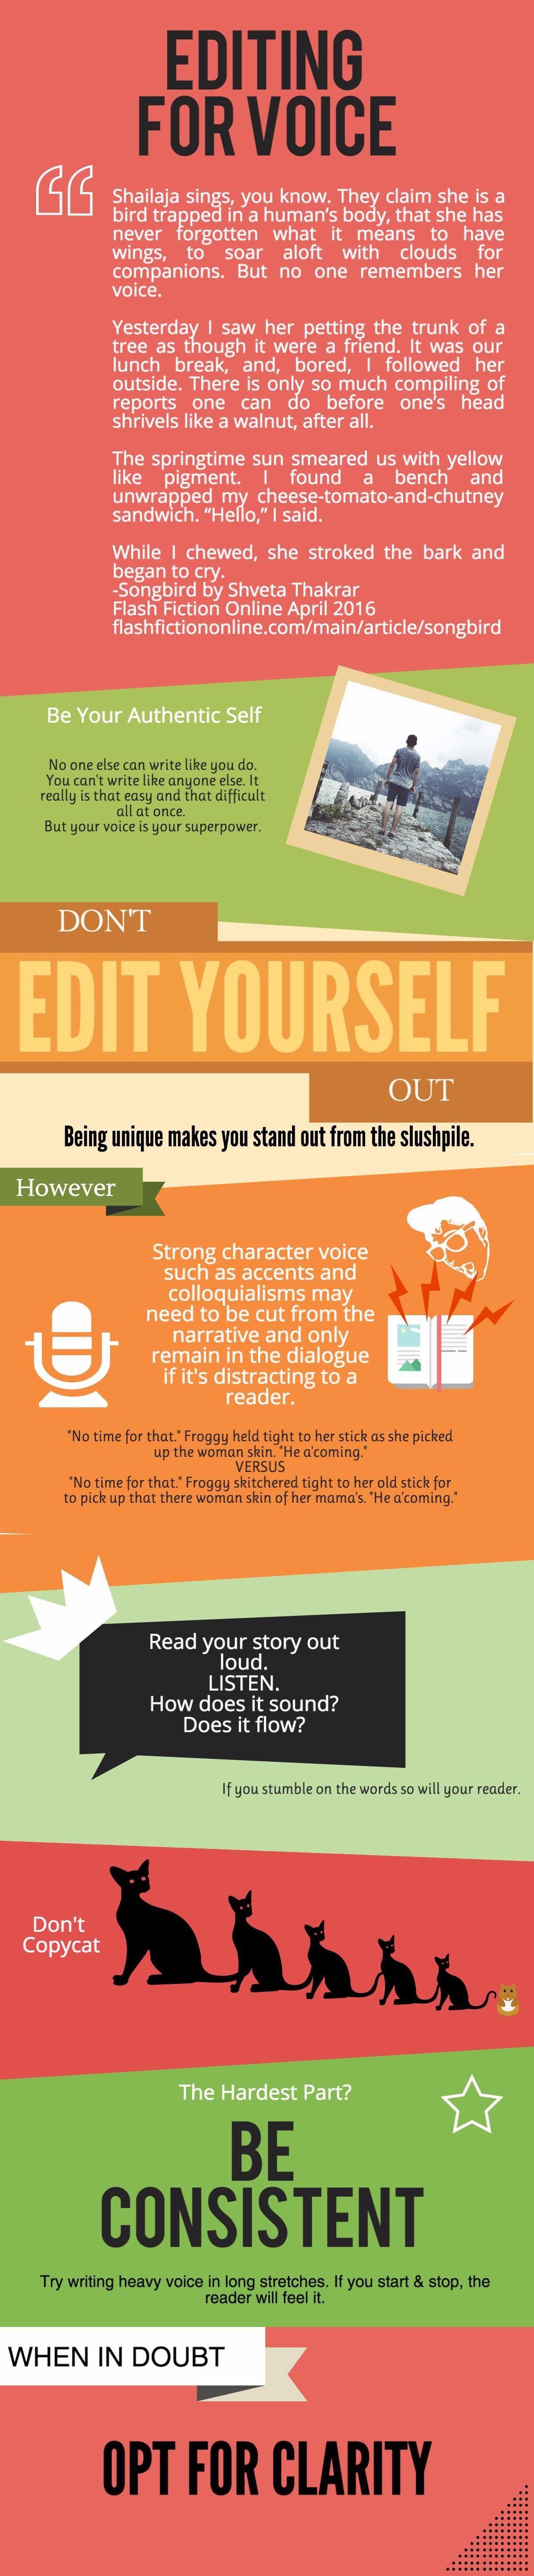 Editing voice